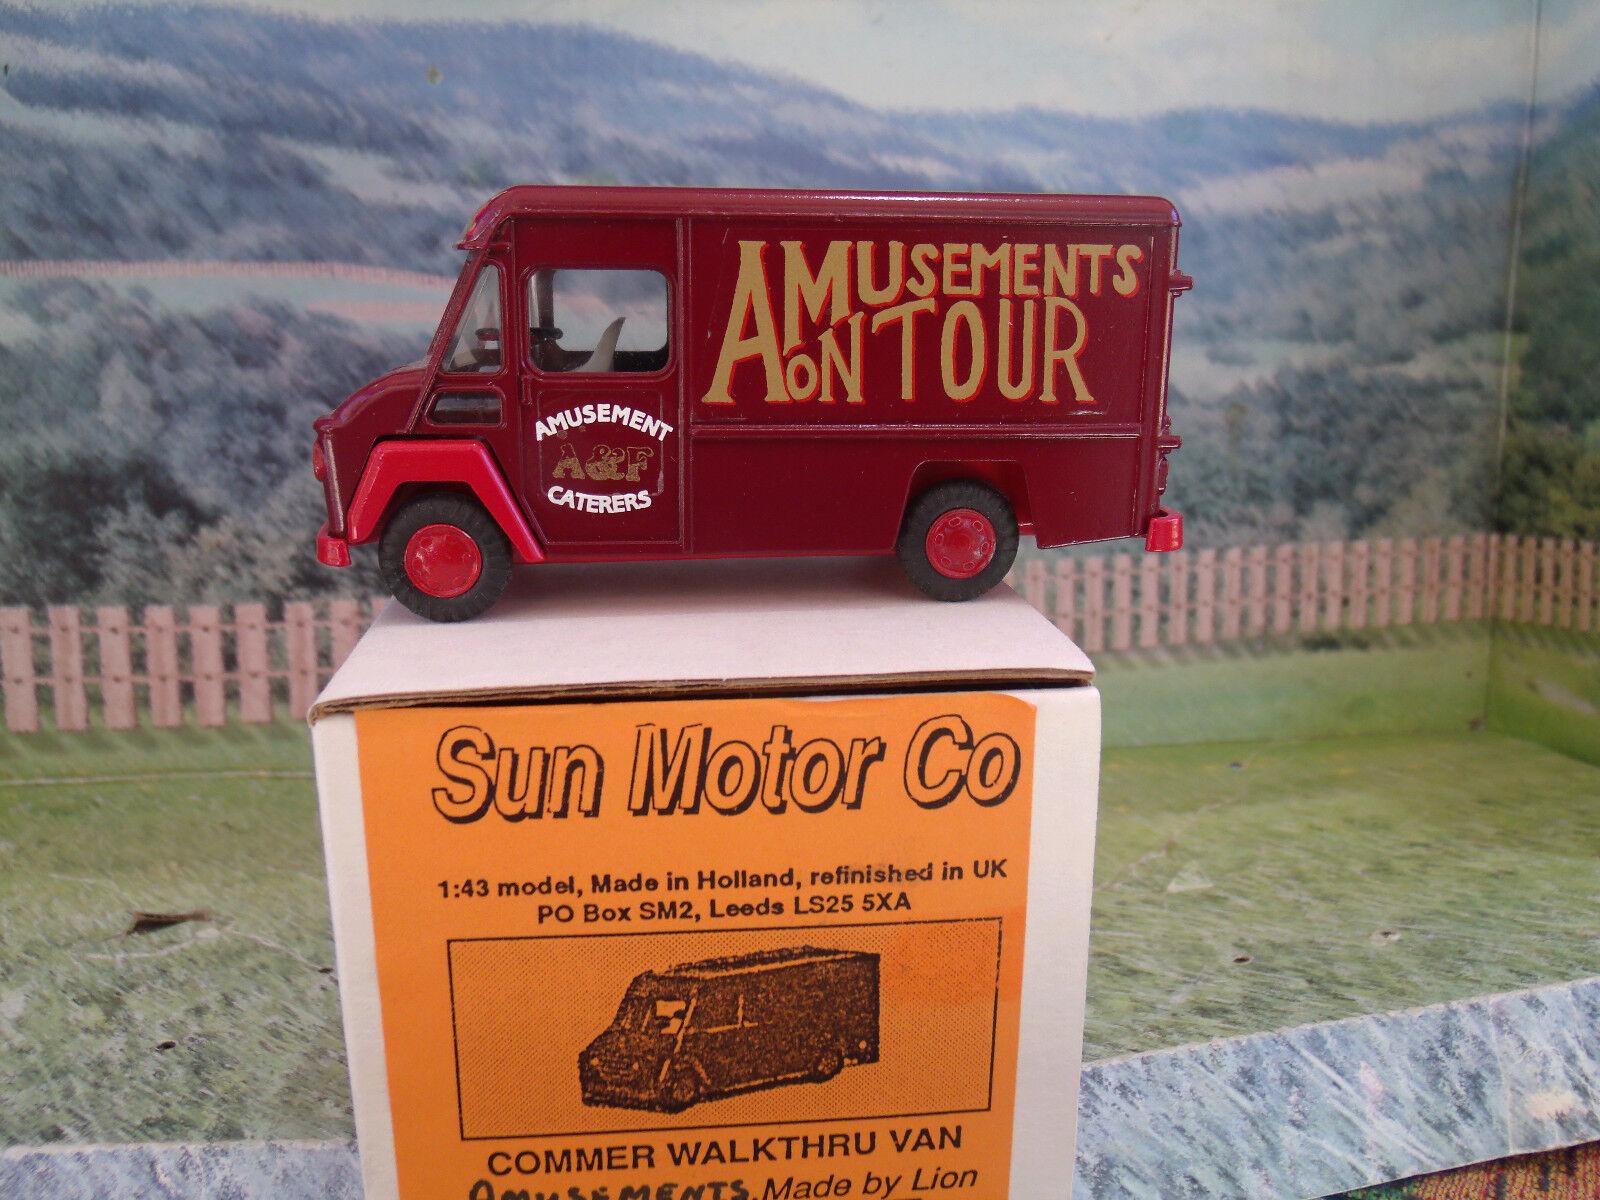 1/43 Sun Motor Co (Inglaterra). van Diversiones On Tour, handbult Modelo